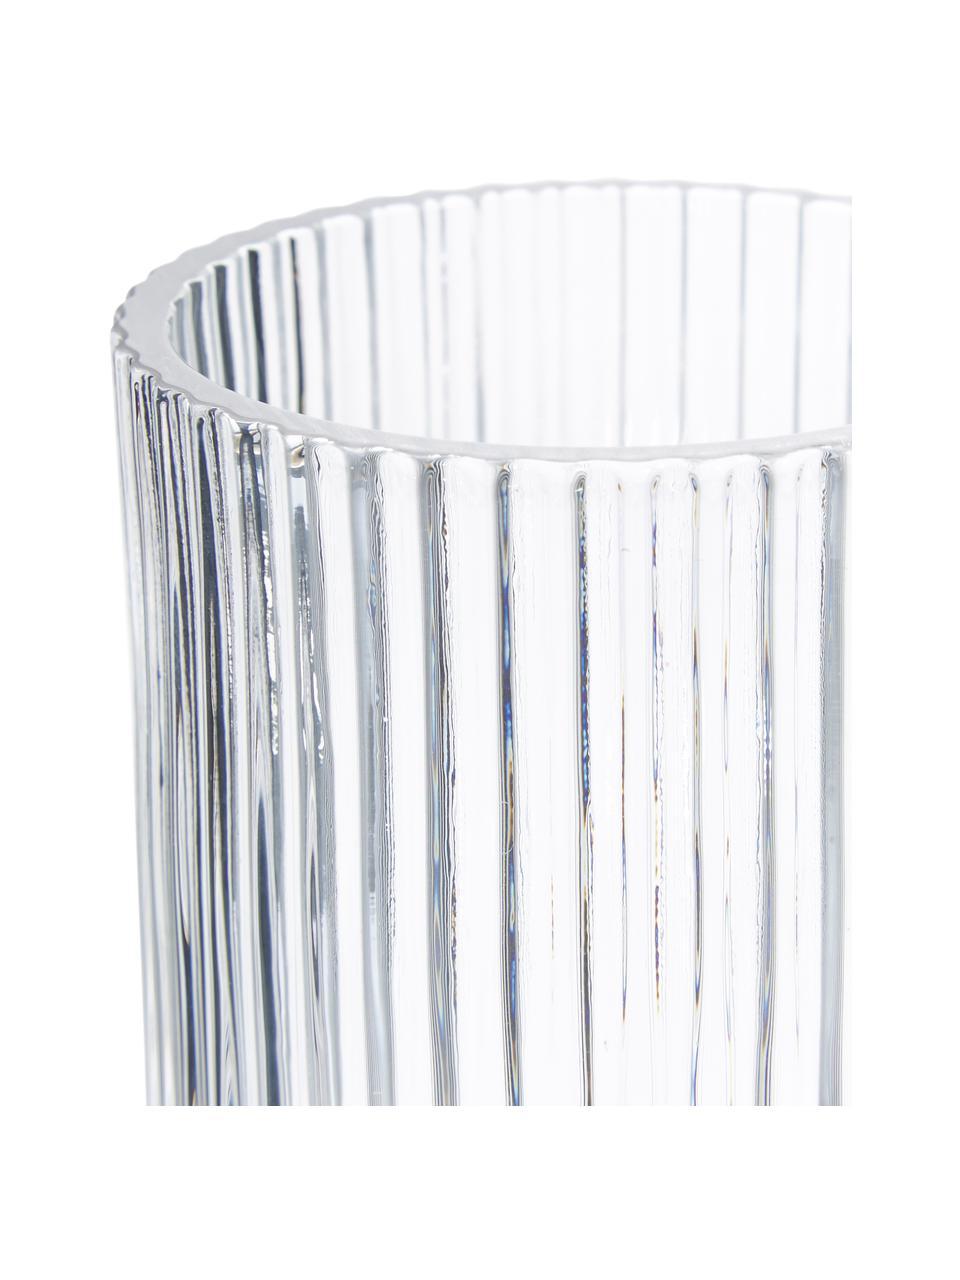 Glas-Zahnputzbecher Gulji, Glas, Transparent, Ø 7 x H 10 cm